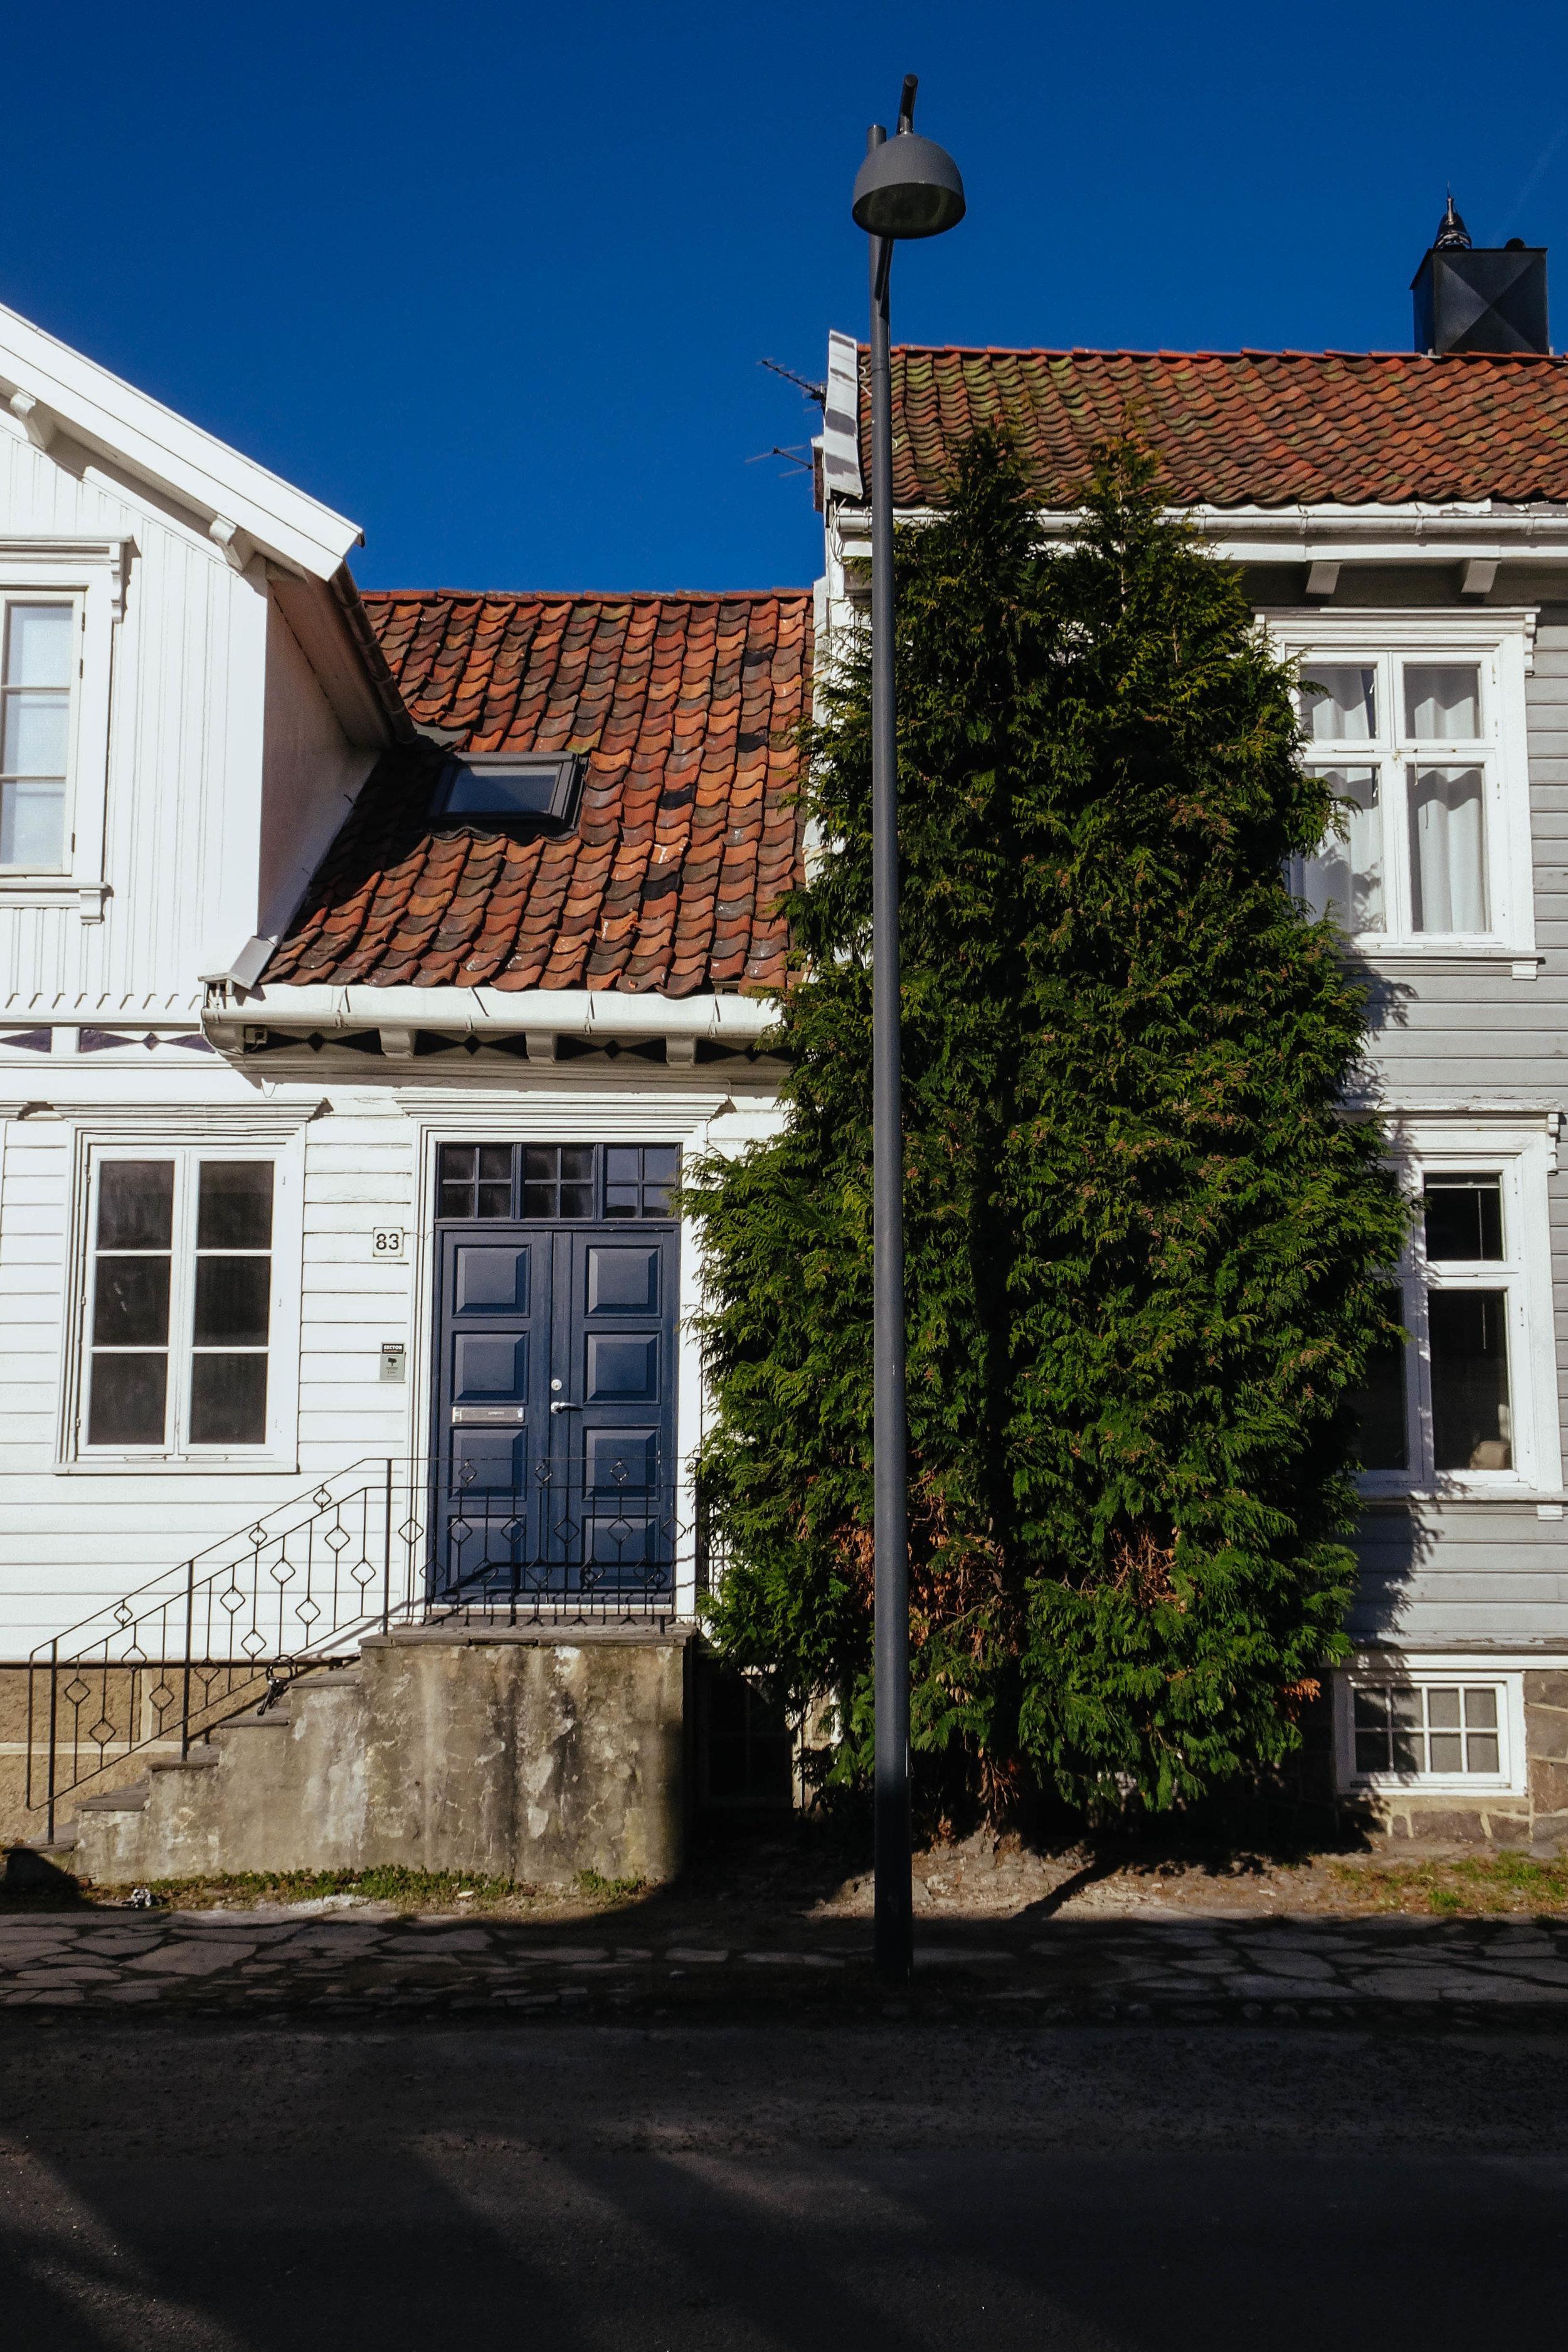 posebyen old town kristiansand southern norway (2).jpg